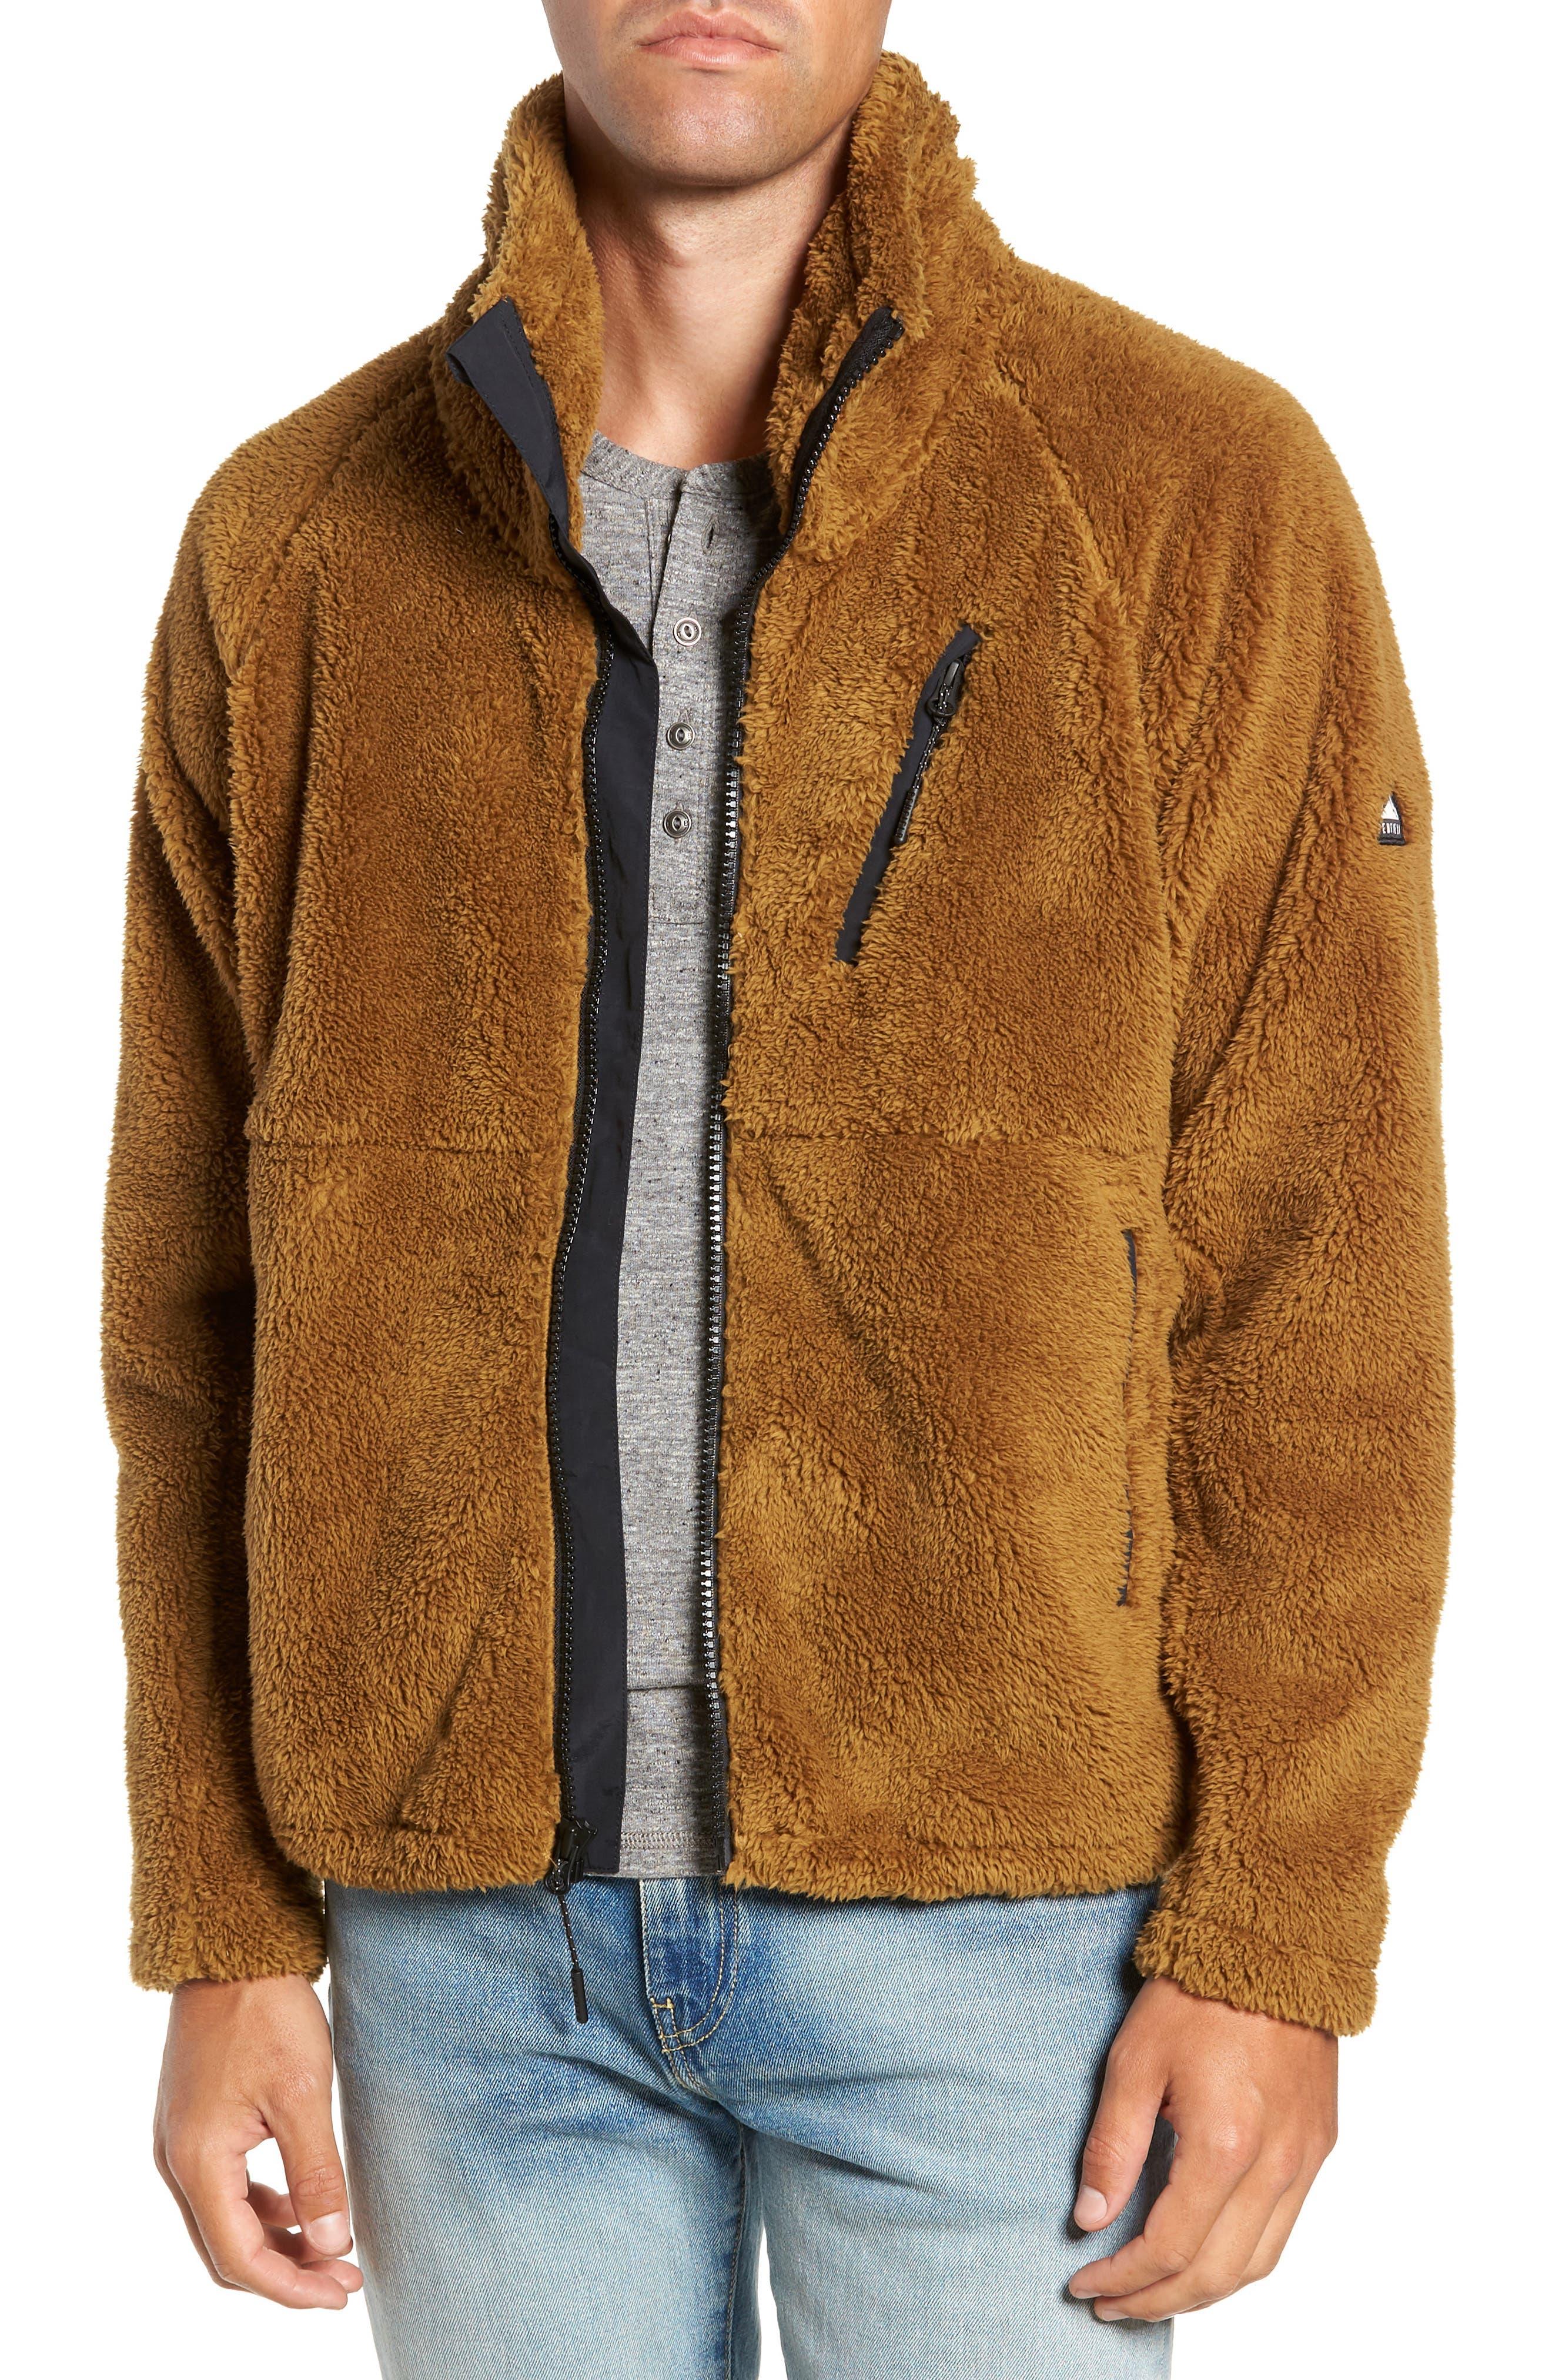 Breakheart Zip Fleece Jacket,                             Main thumbnail 1, color,                             BREEN